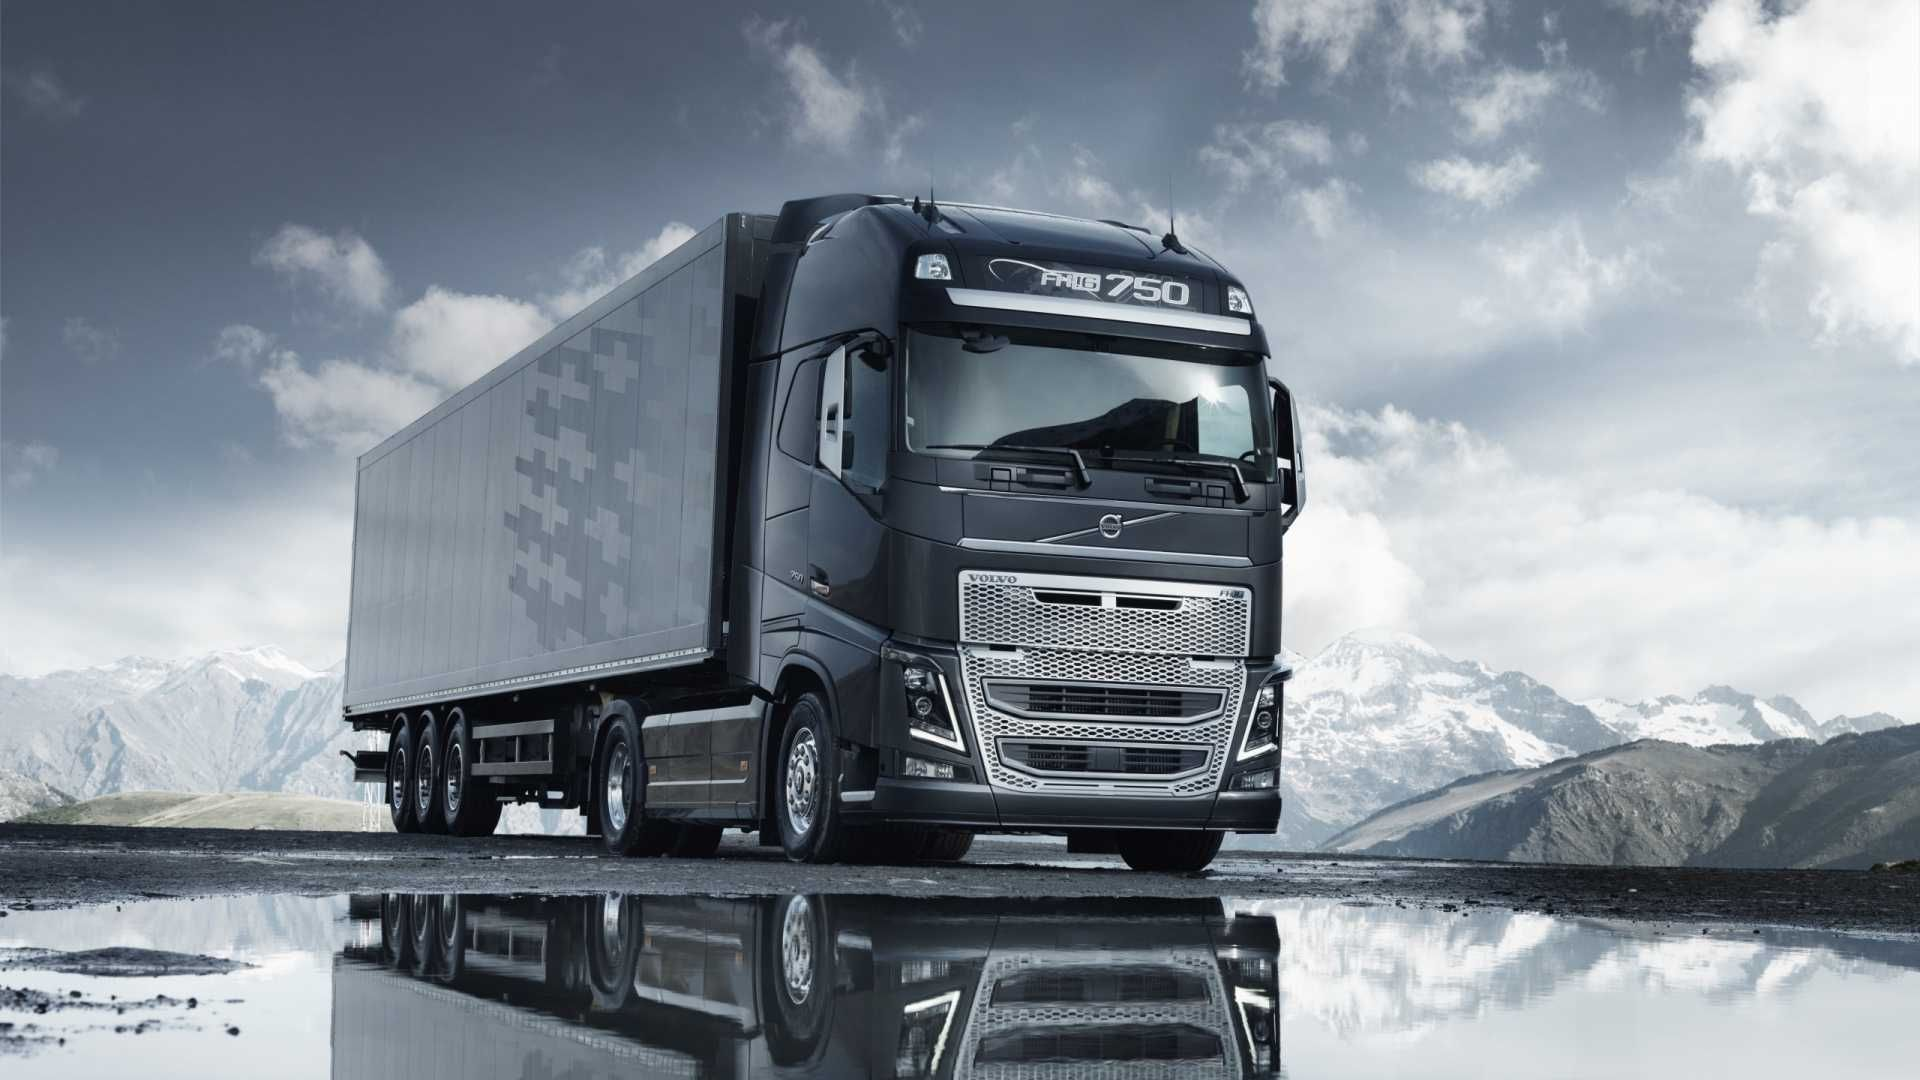 Volvo Truck Wallpaper Images Ykk Volvo Trucks Volvo Trucks